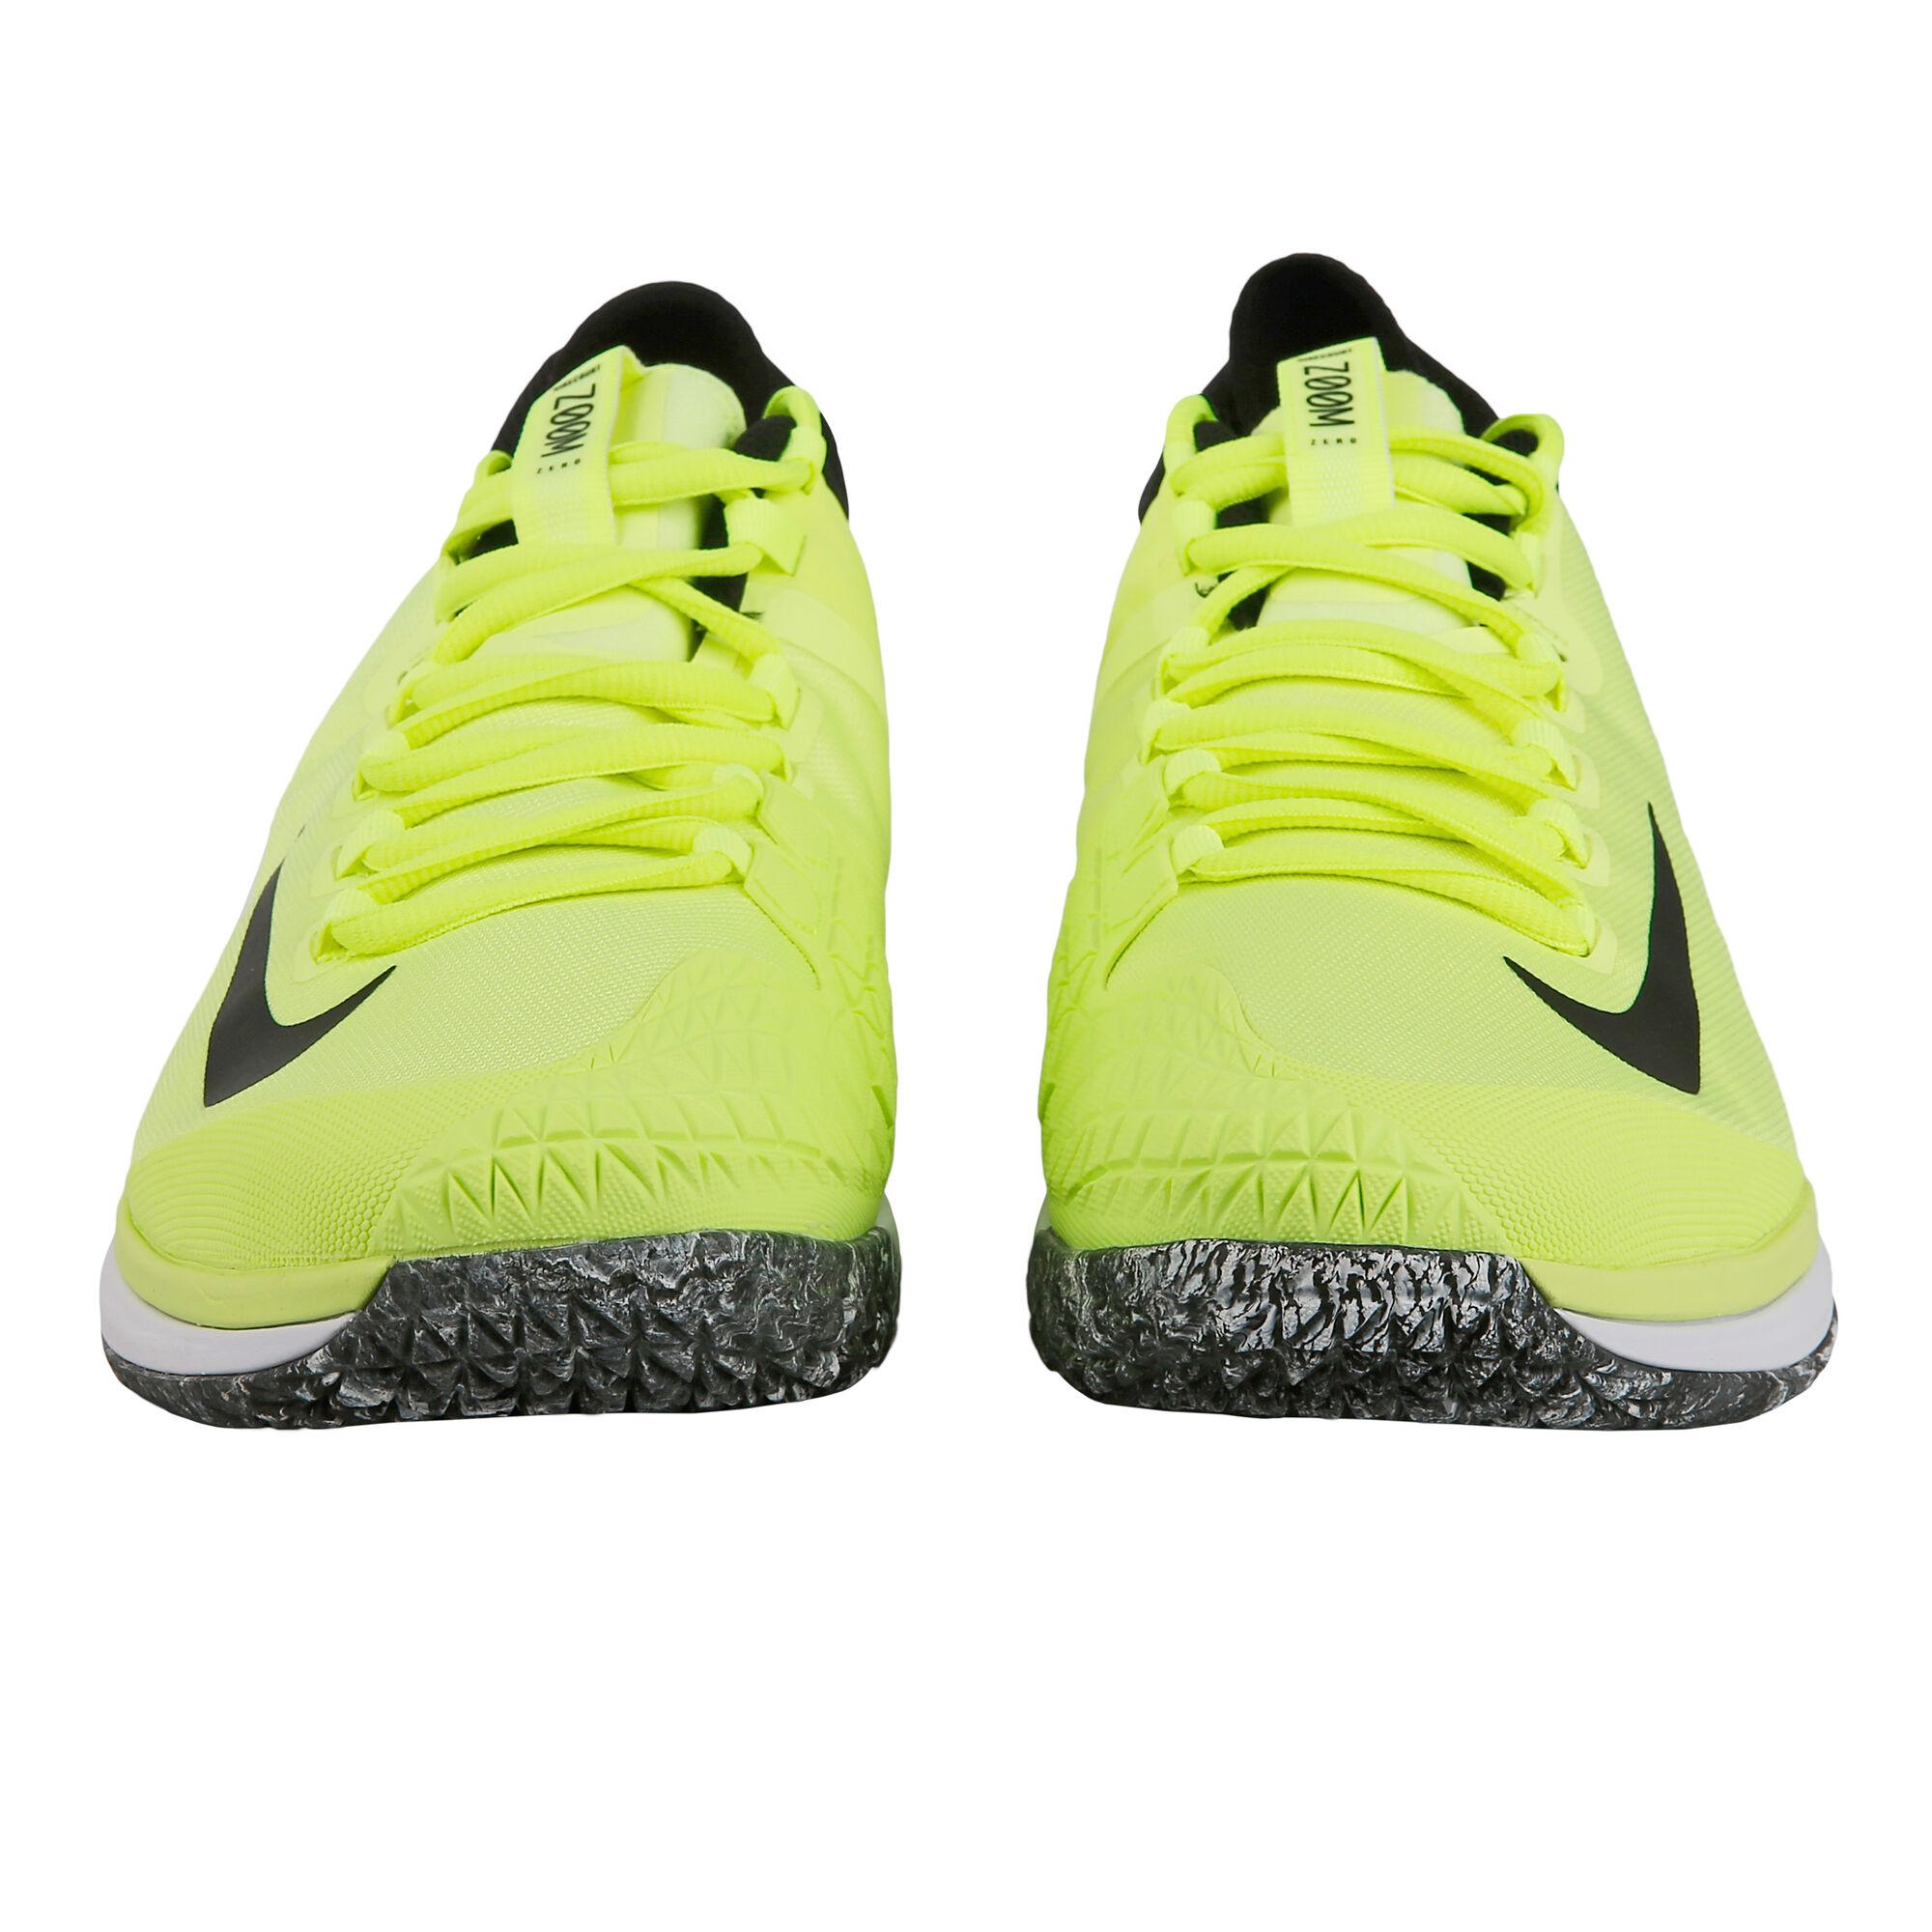 5675d29e9d Nike Air Zoom Zero Premium Chaussure Tout Terrain Hommes - Jaunes ...